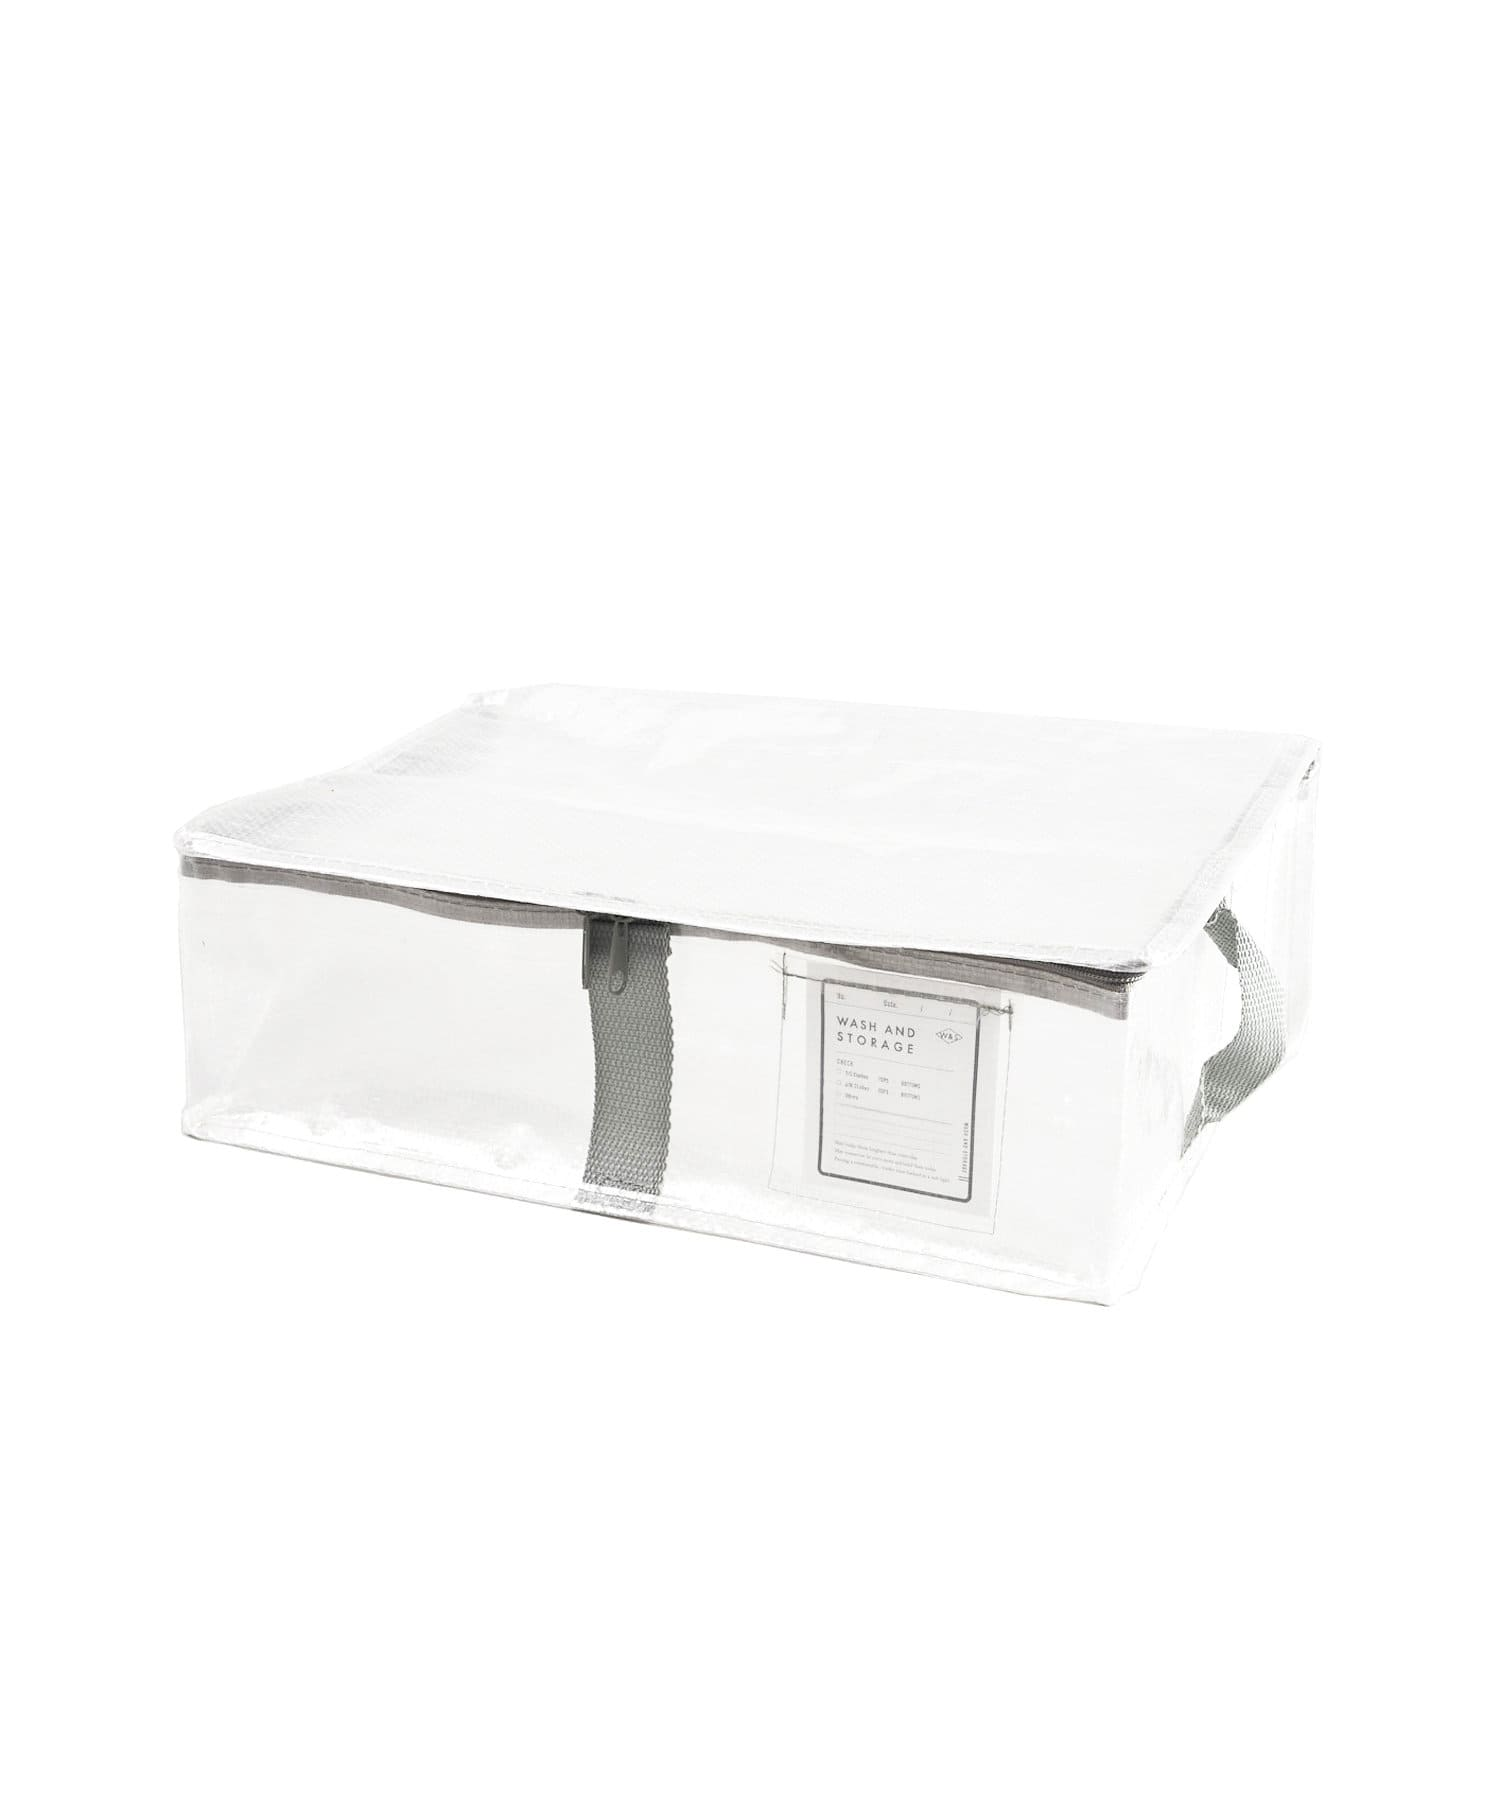 3COINS(スリーコインズ) 【衣替えやお部屋の整理に】フタ付きクリアフラットボックス